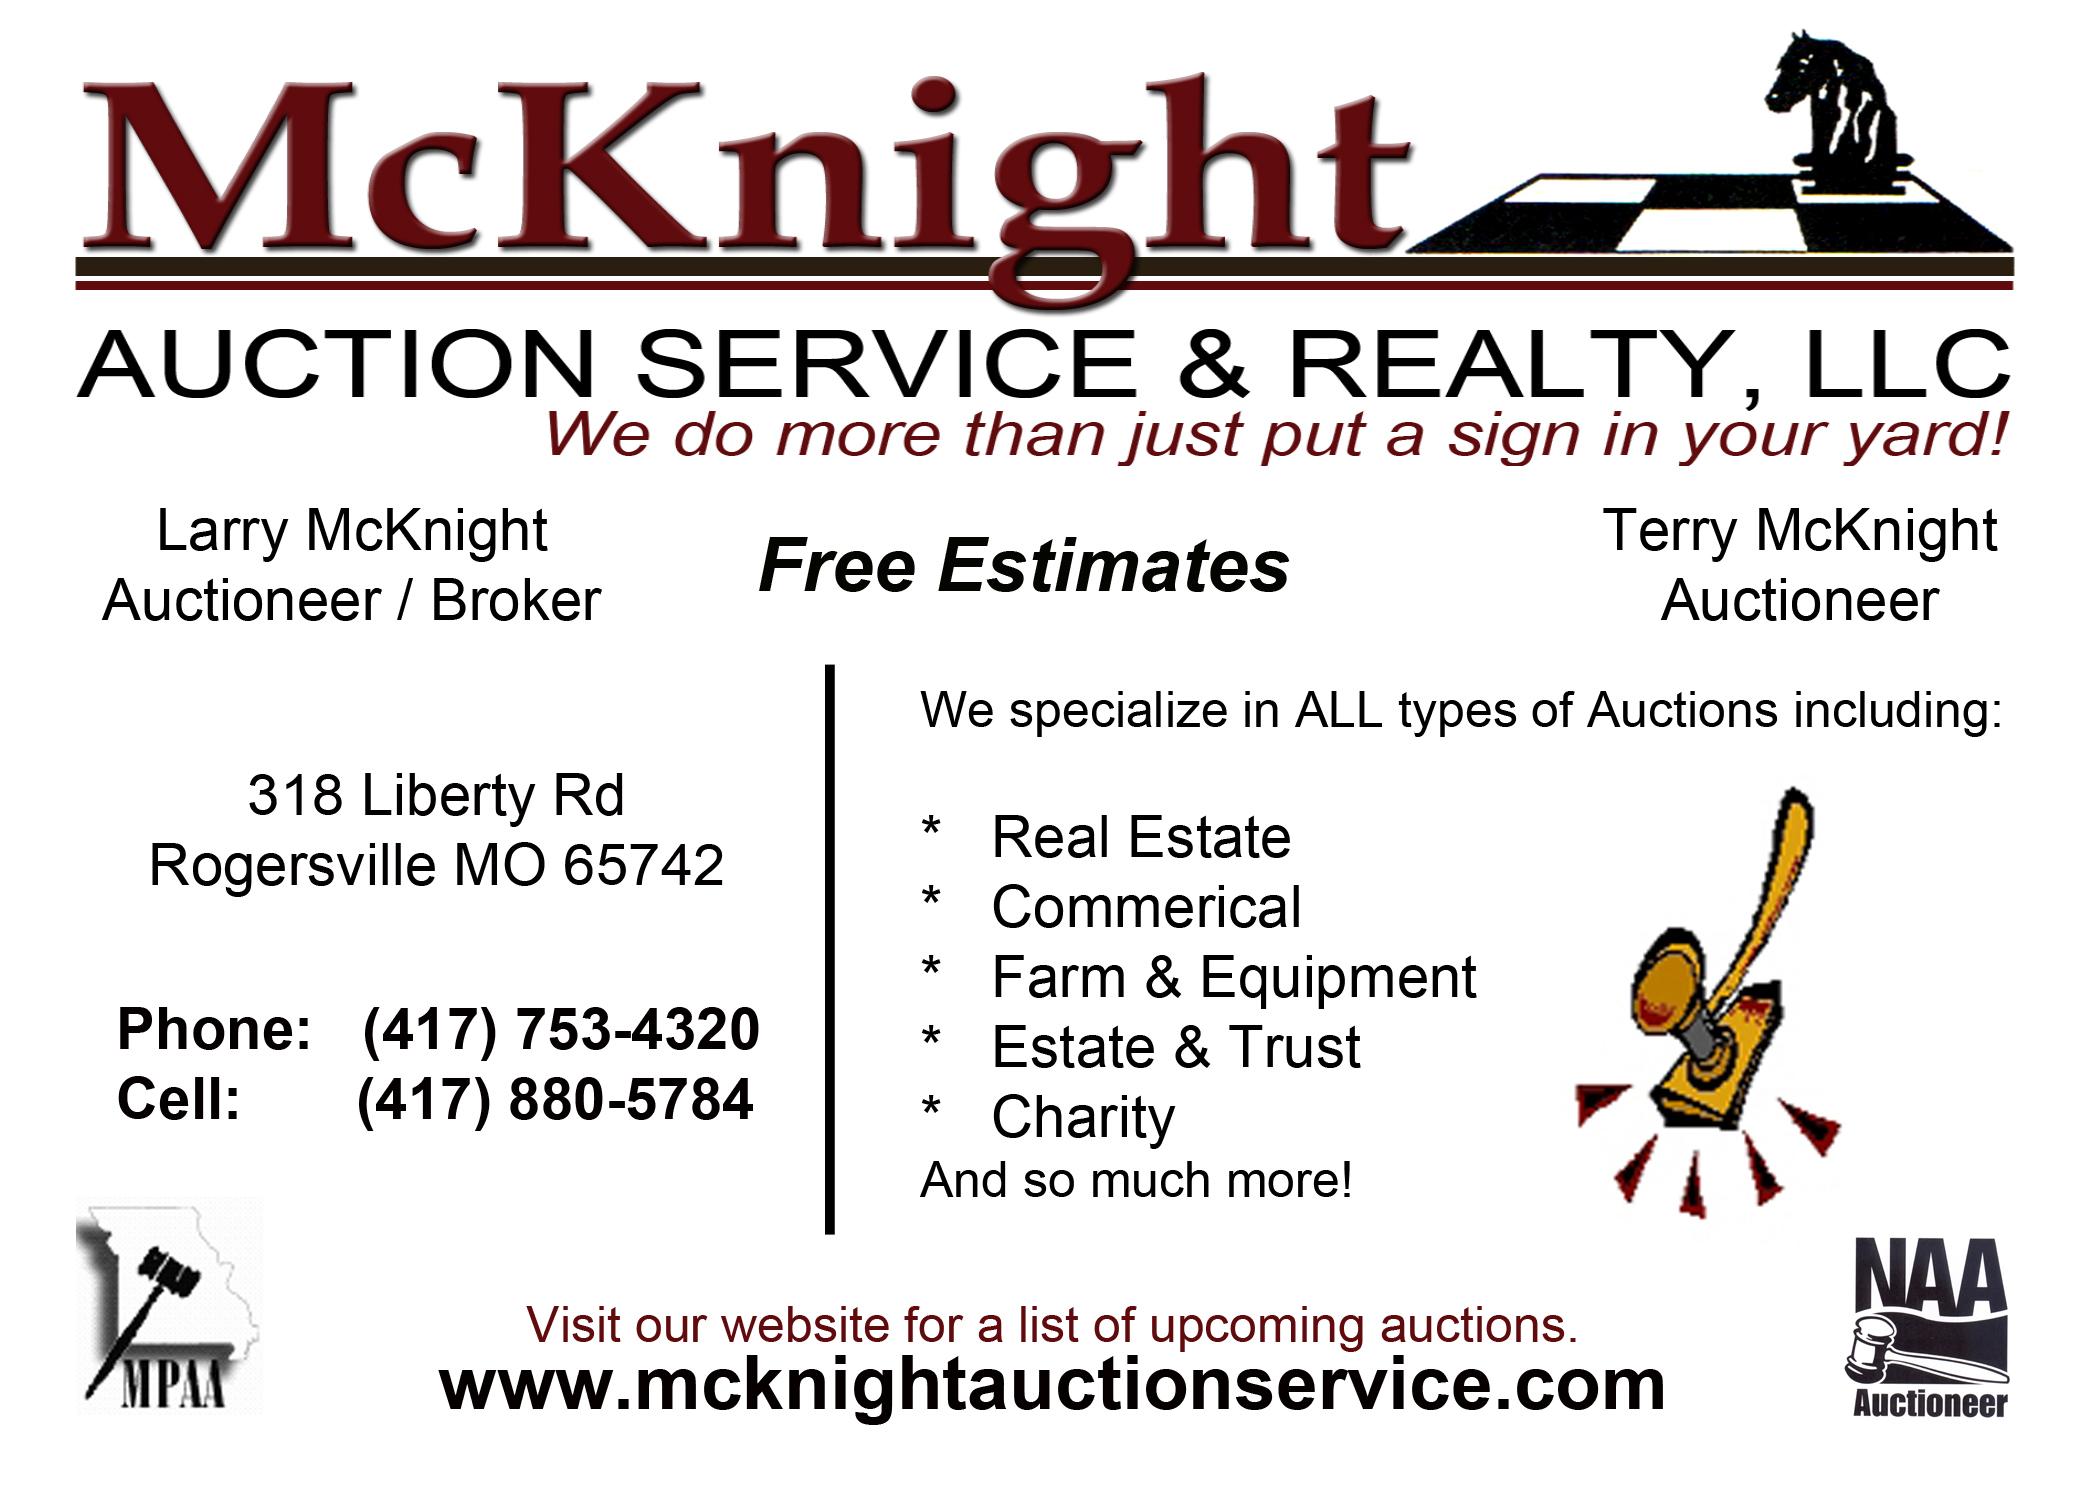 McKnight Auction Service & Realty, LLC